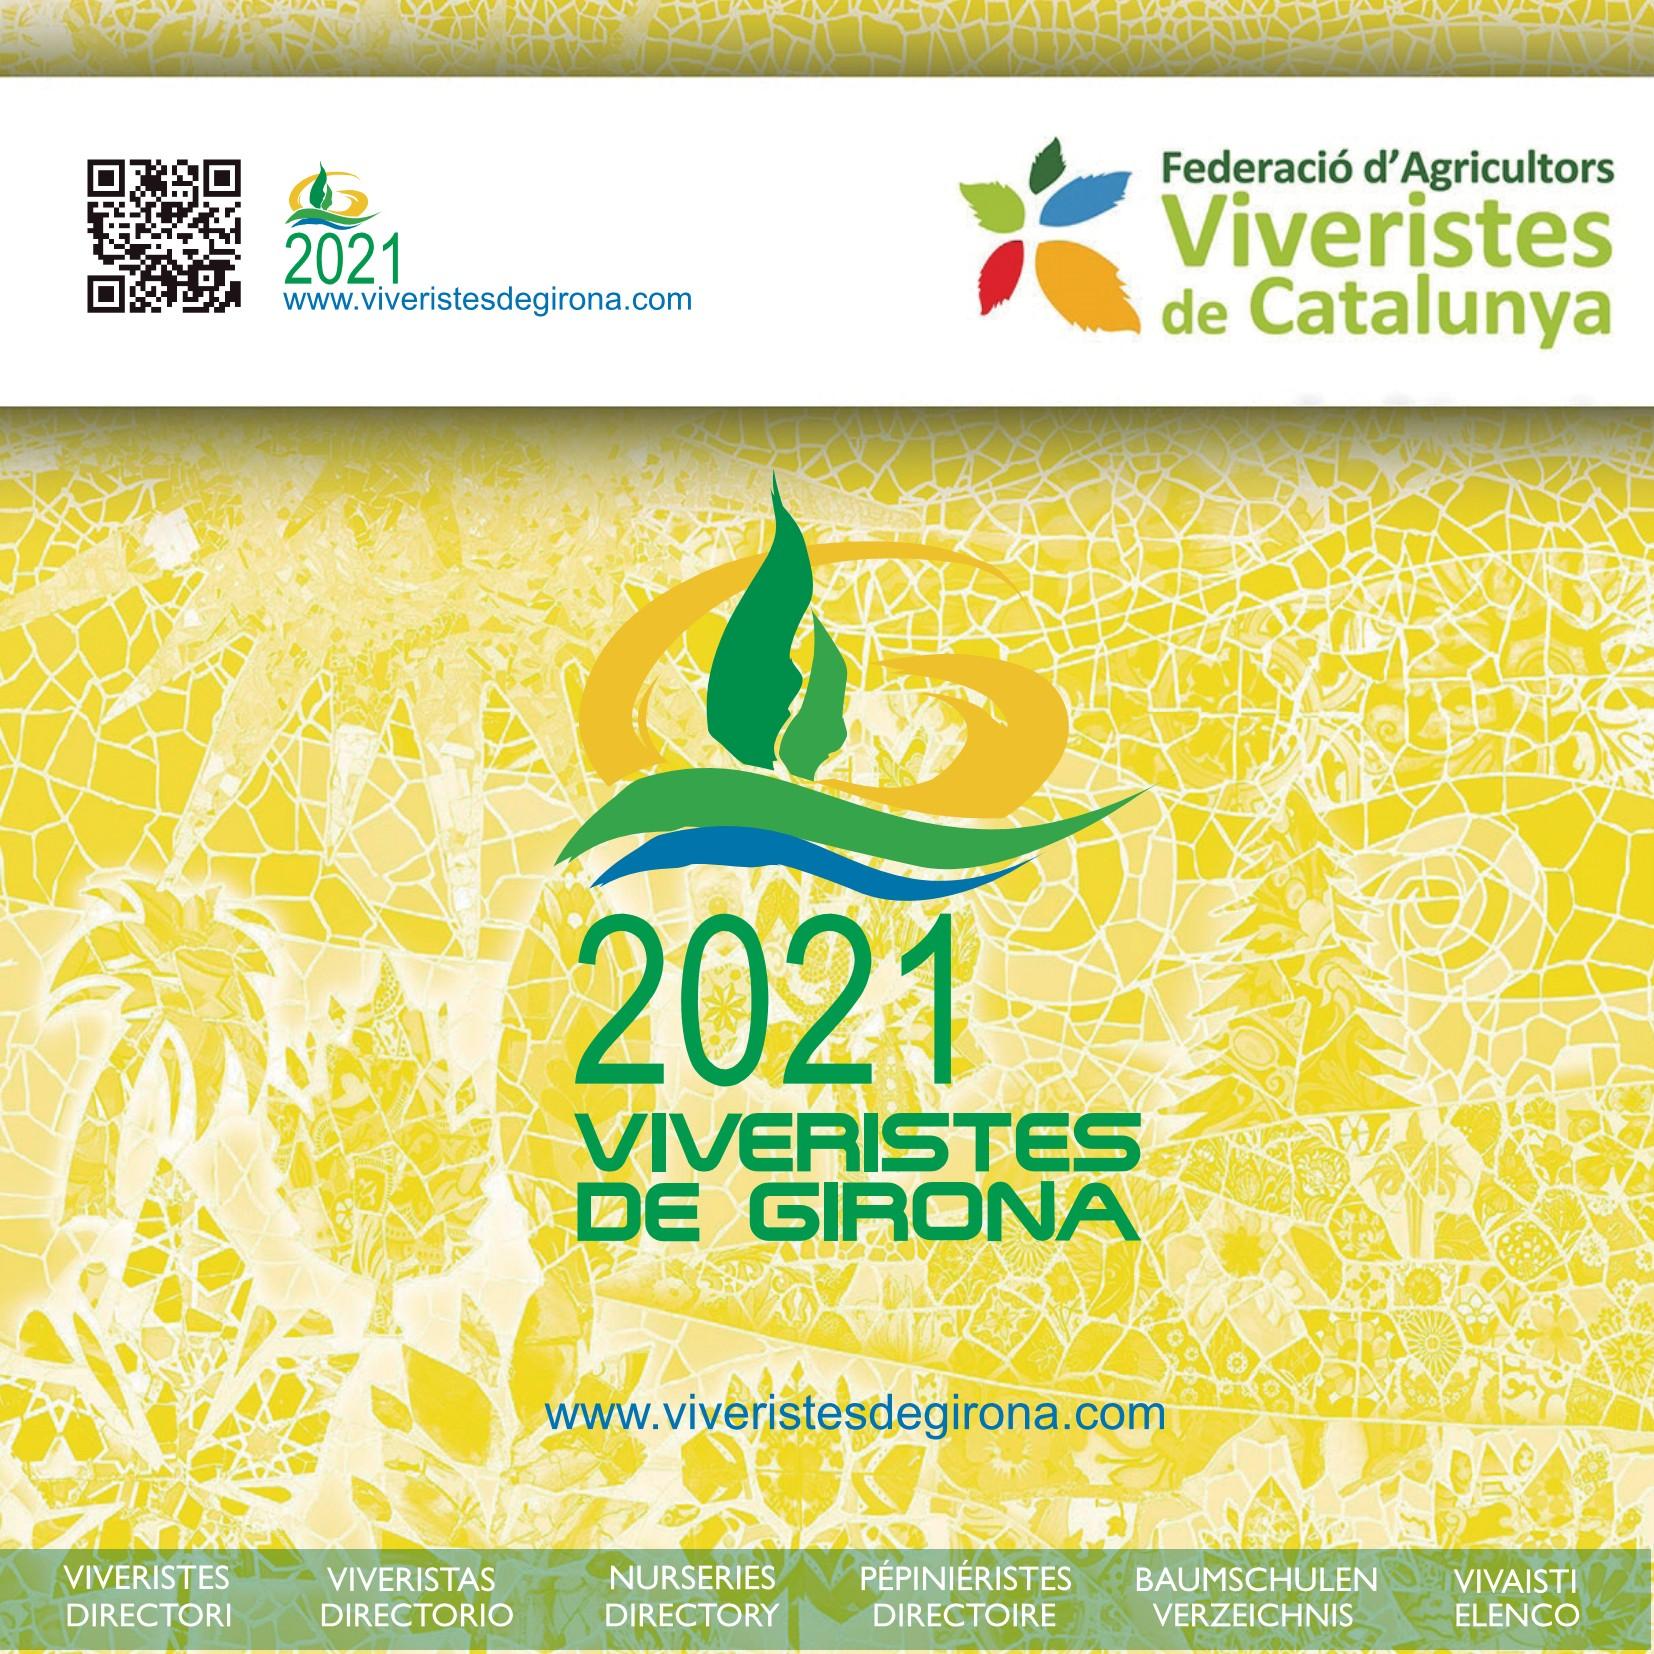 Guia_Viveristes_Girona_2021.jpg